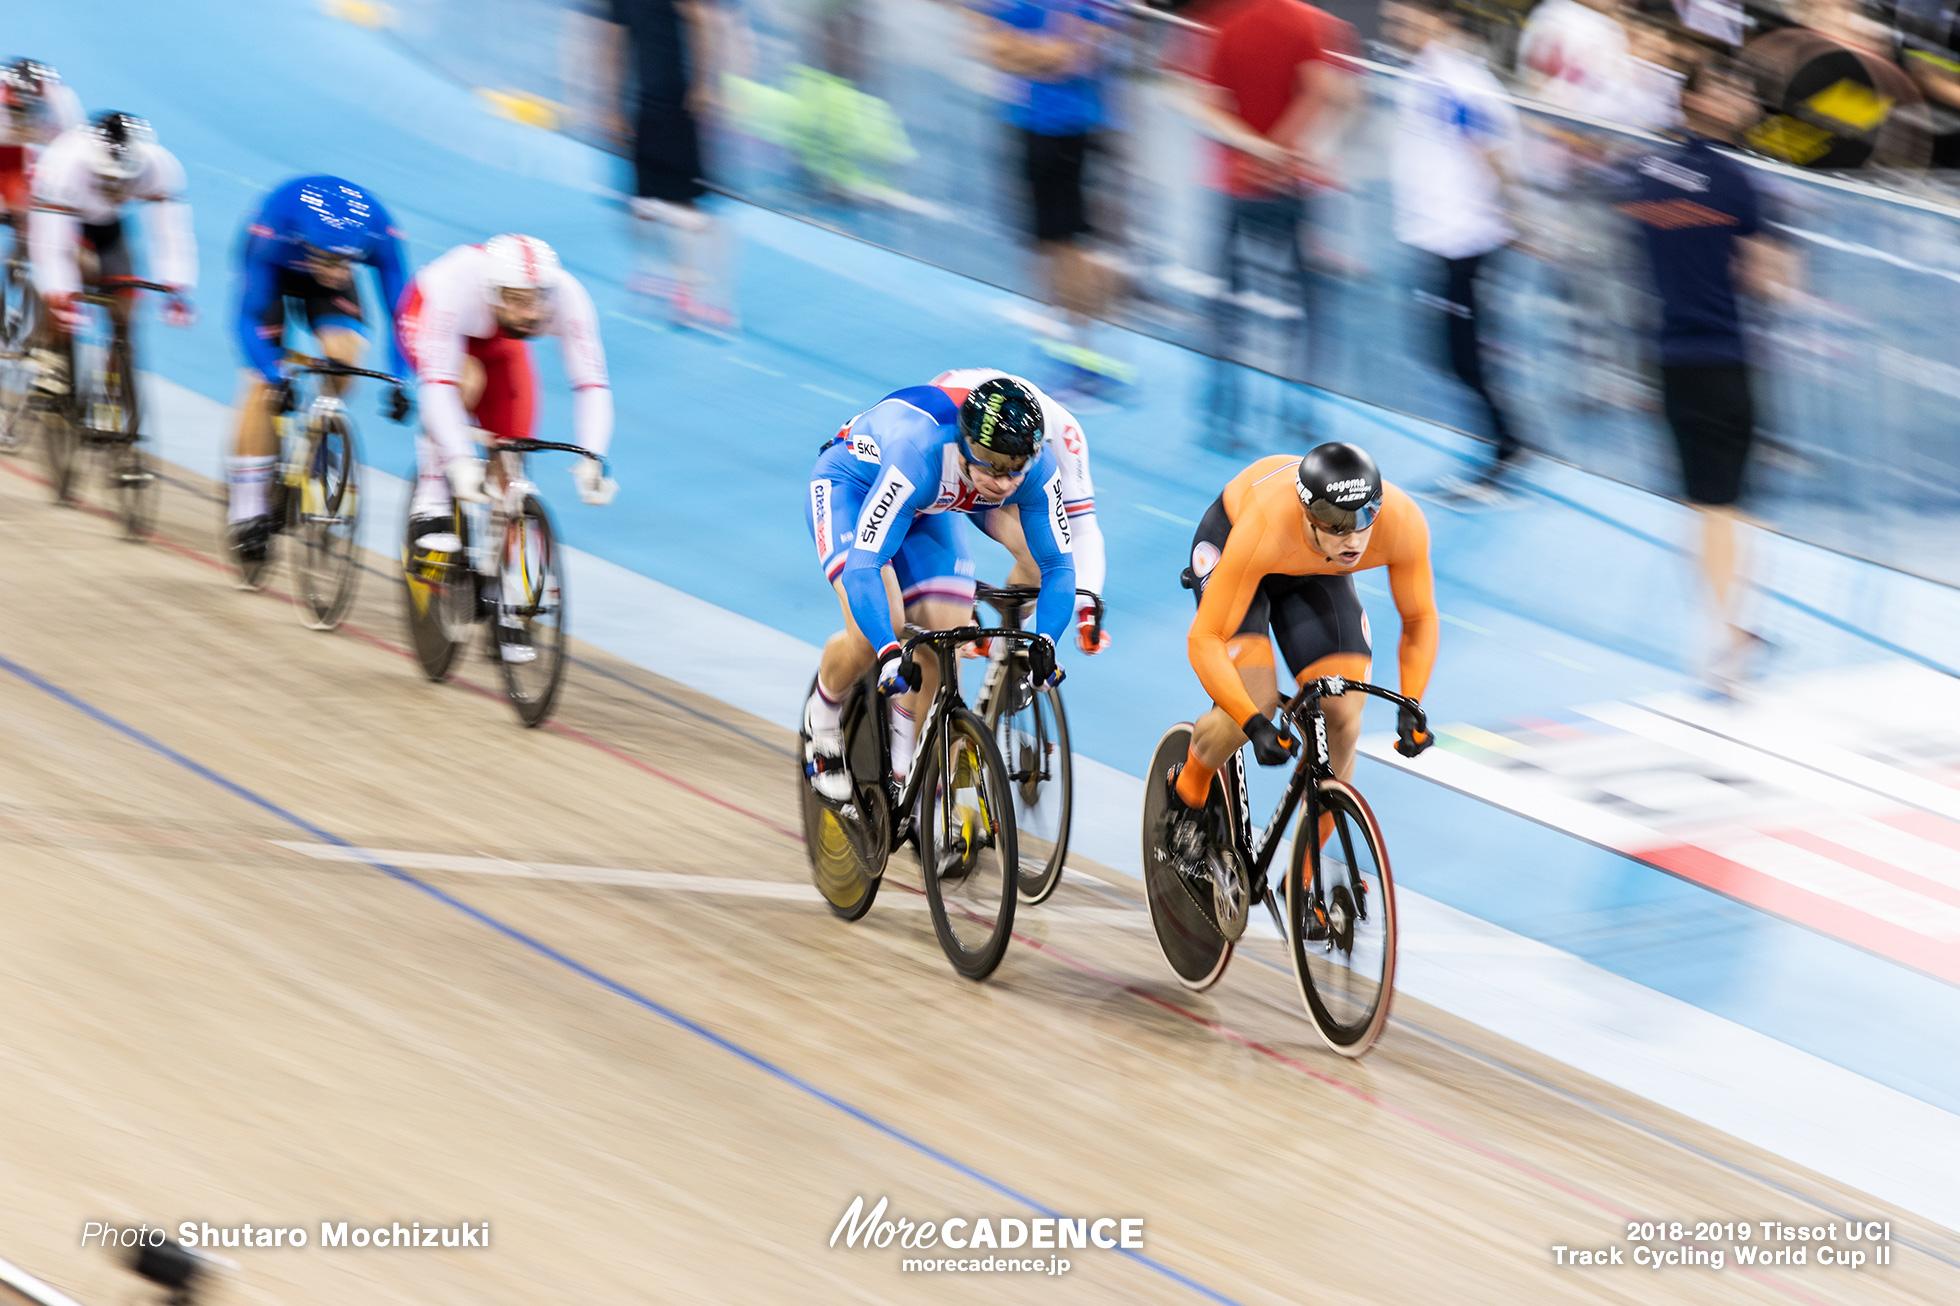 2018-2019 Tissot UCI Track Cycling World Cup II Men's Keirin Qualifying Heat2